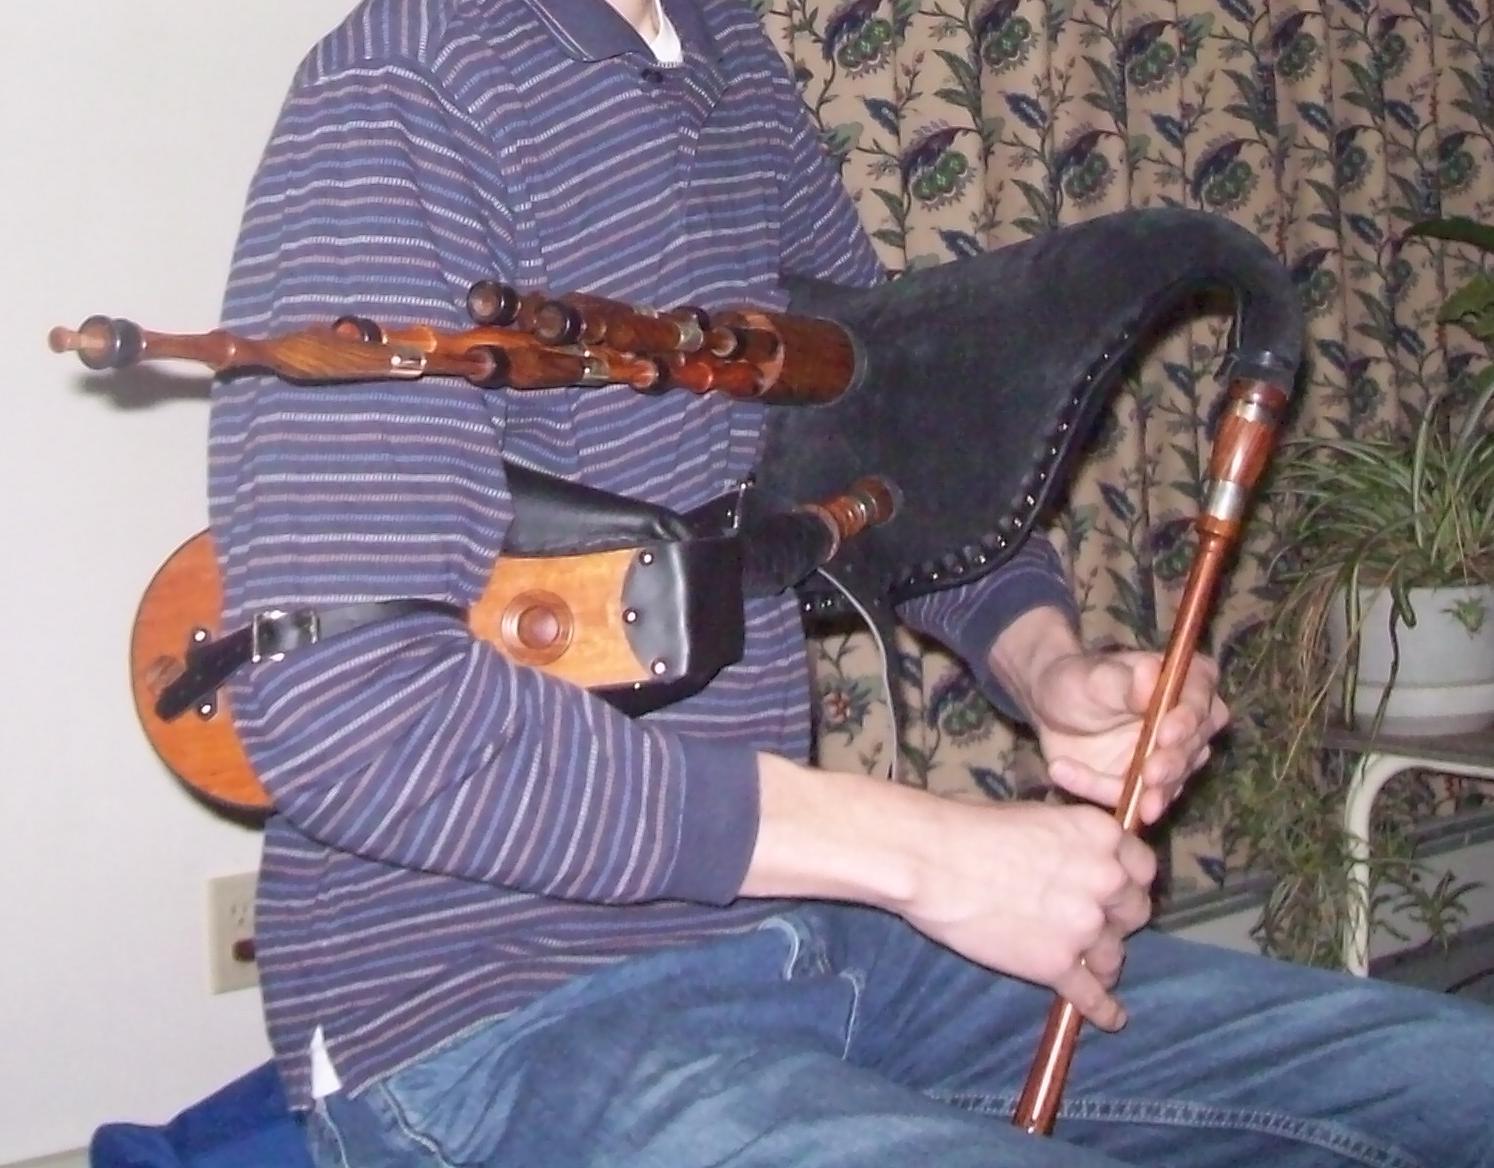 http://upload.wikimedia.org/wikipedia/commons/5/56/Scottish_Smallpipes.JPG